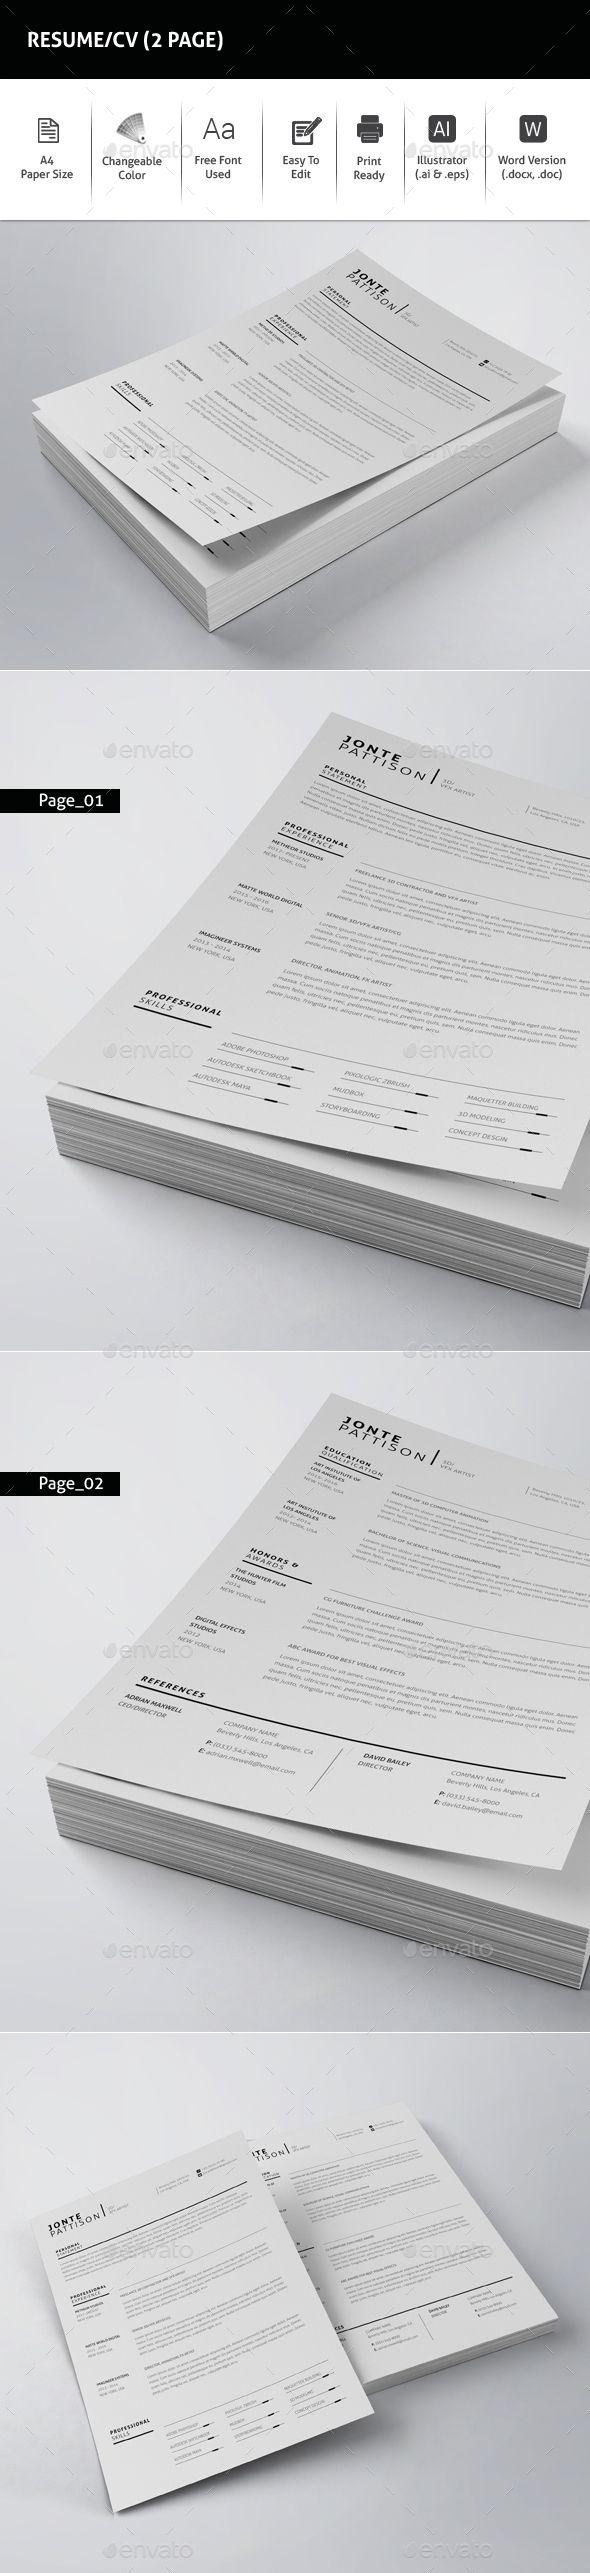 printable resume format%0A Resume CV    Page